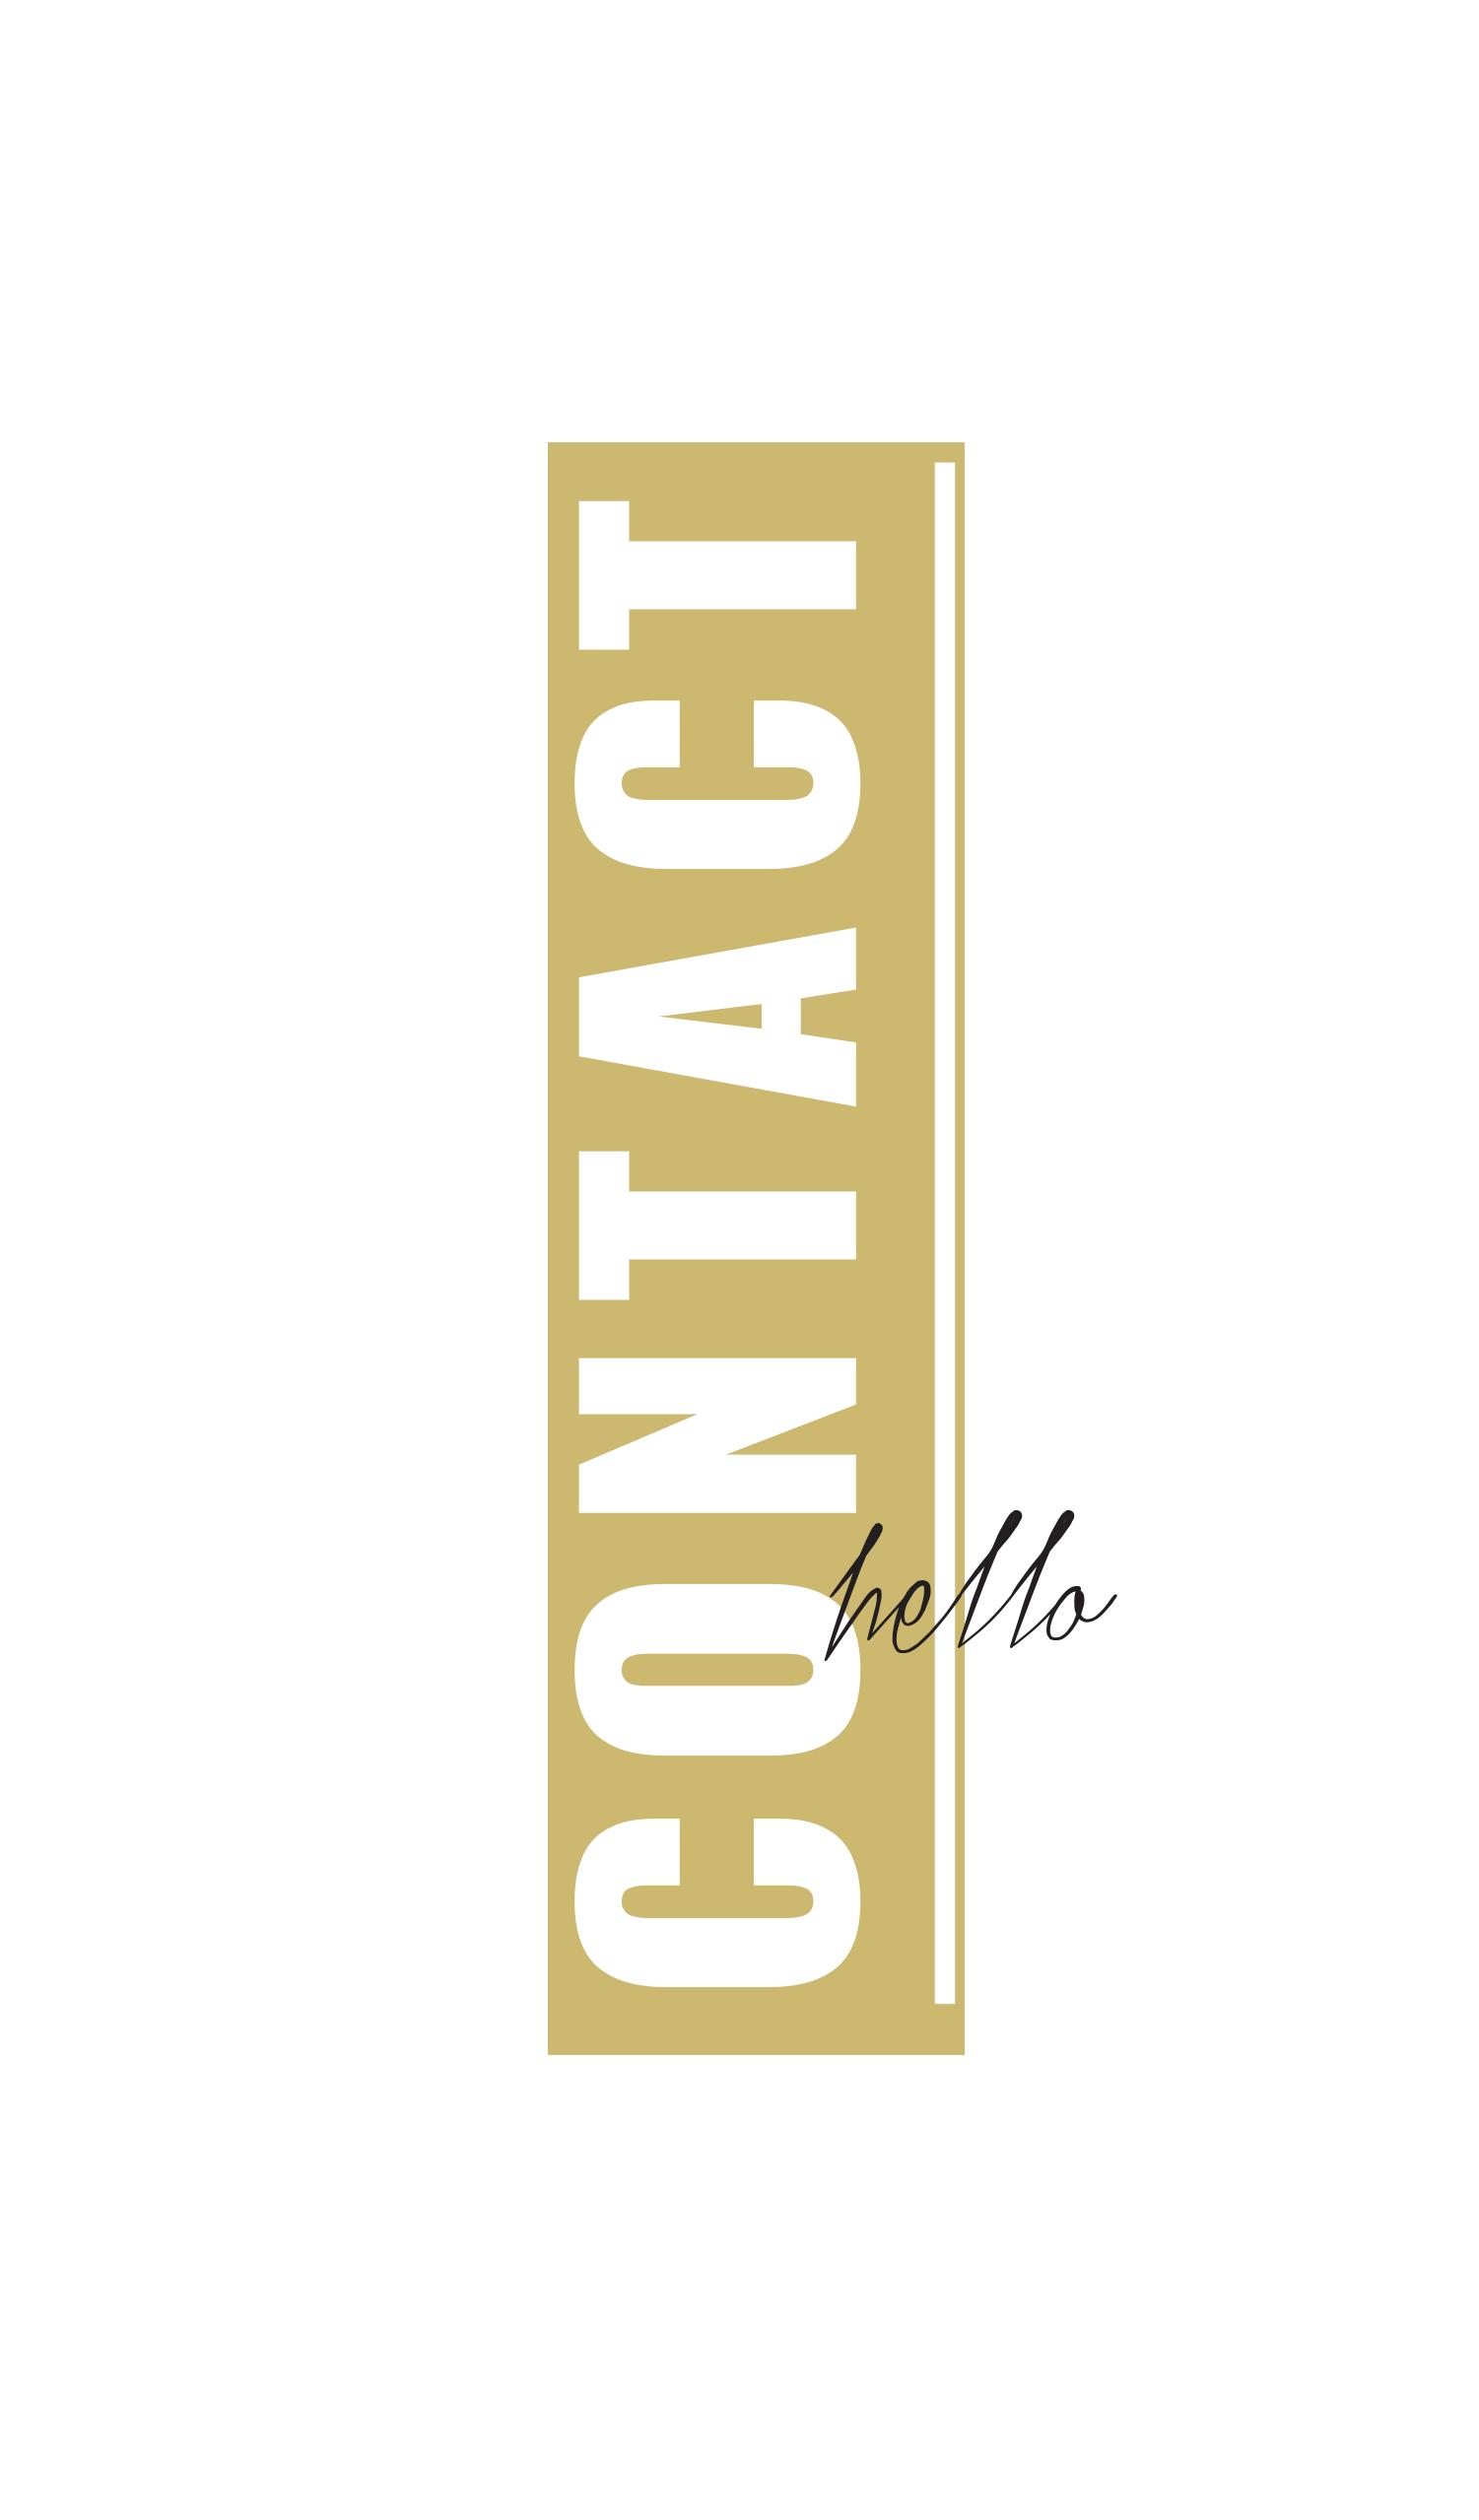 AV-Contact-text.png